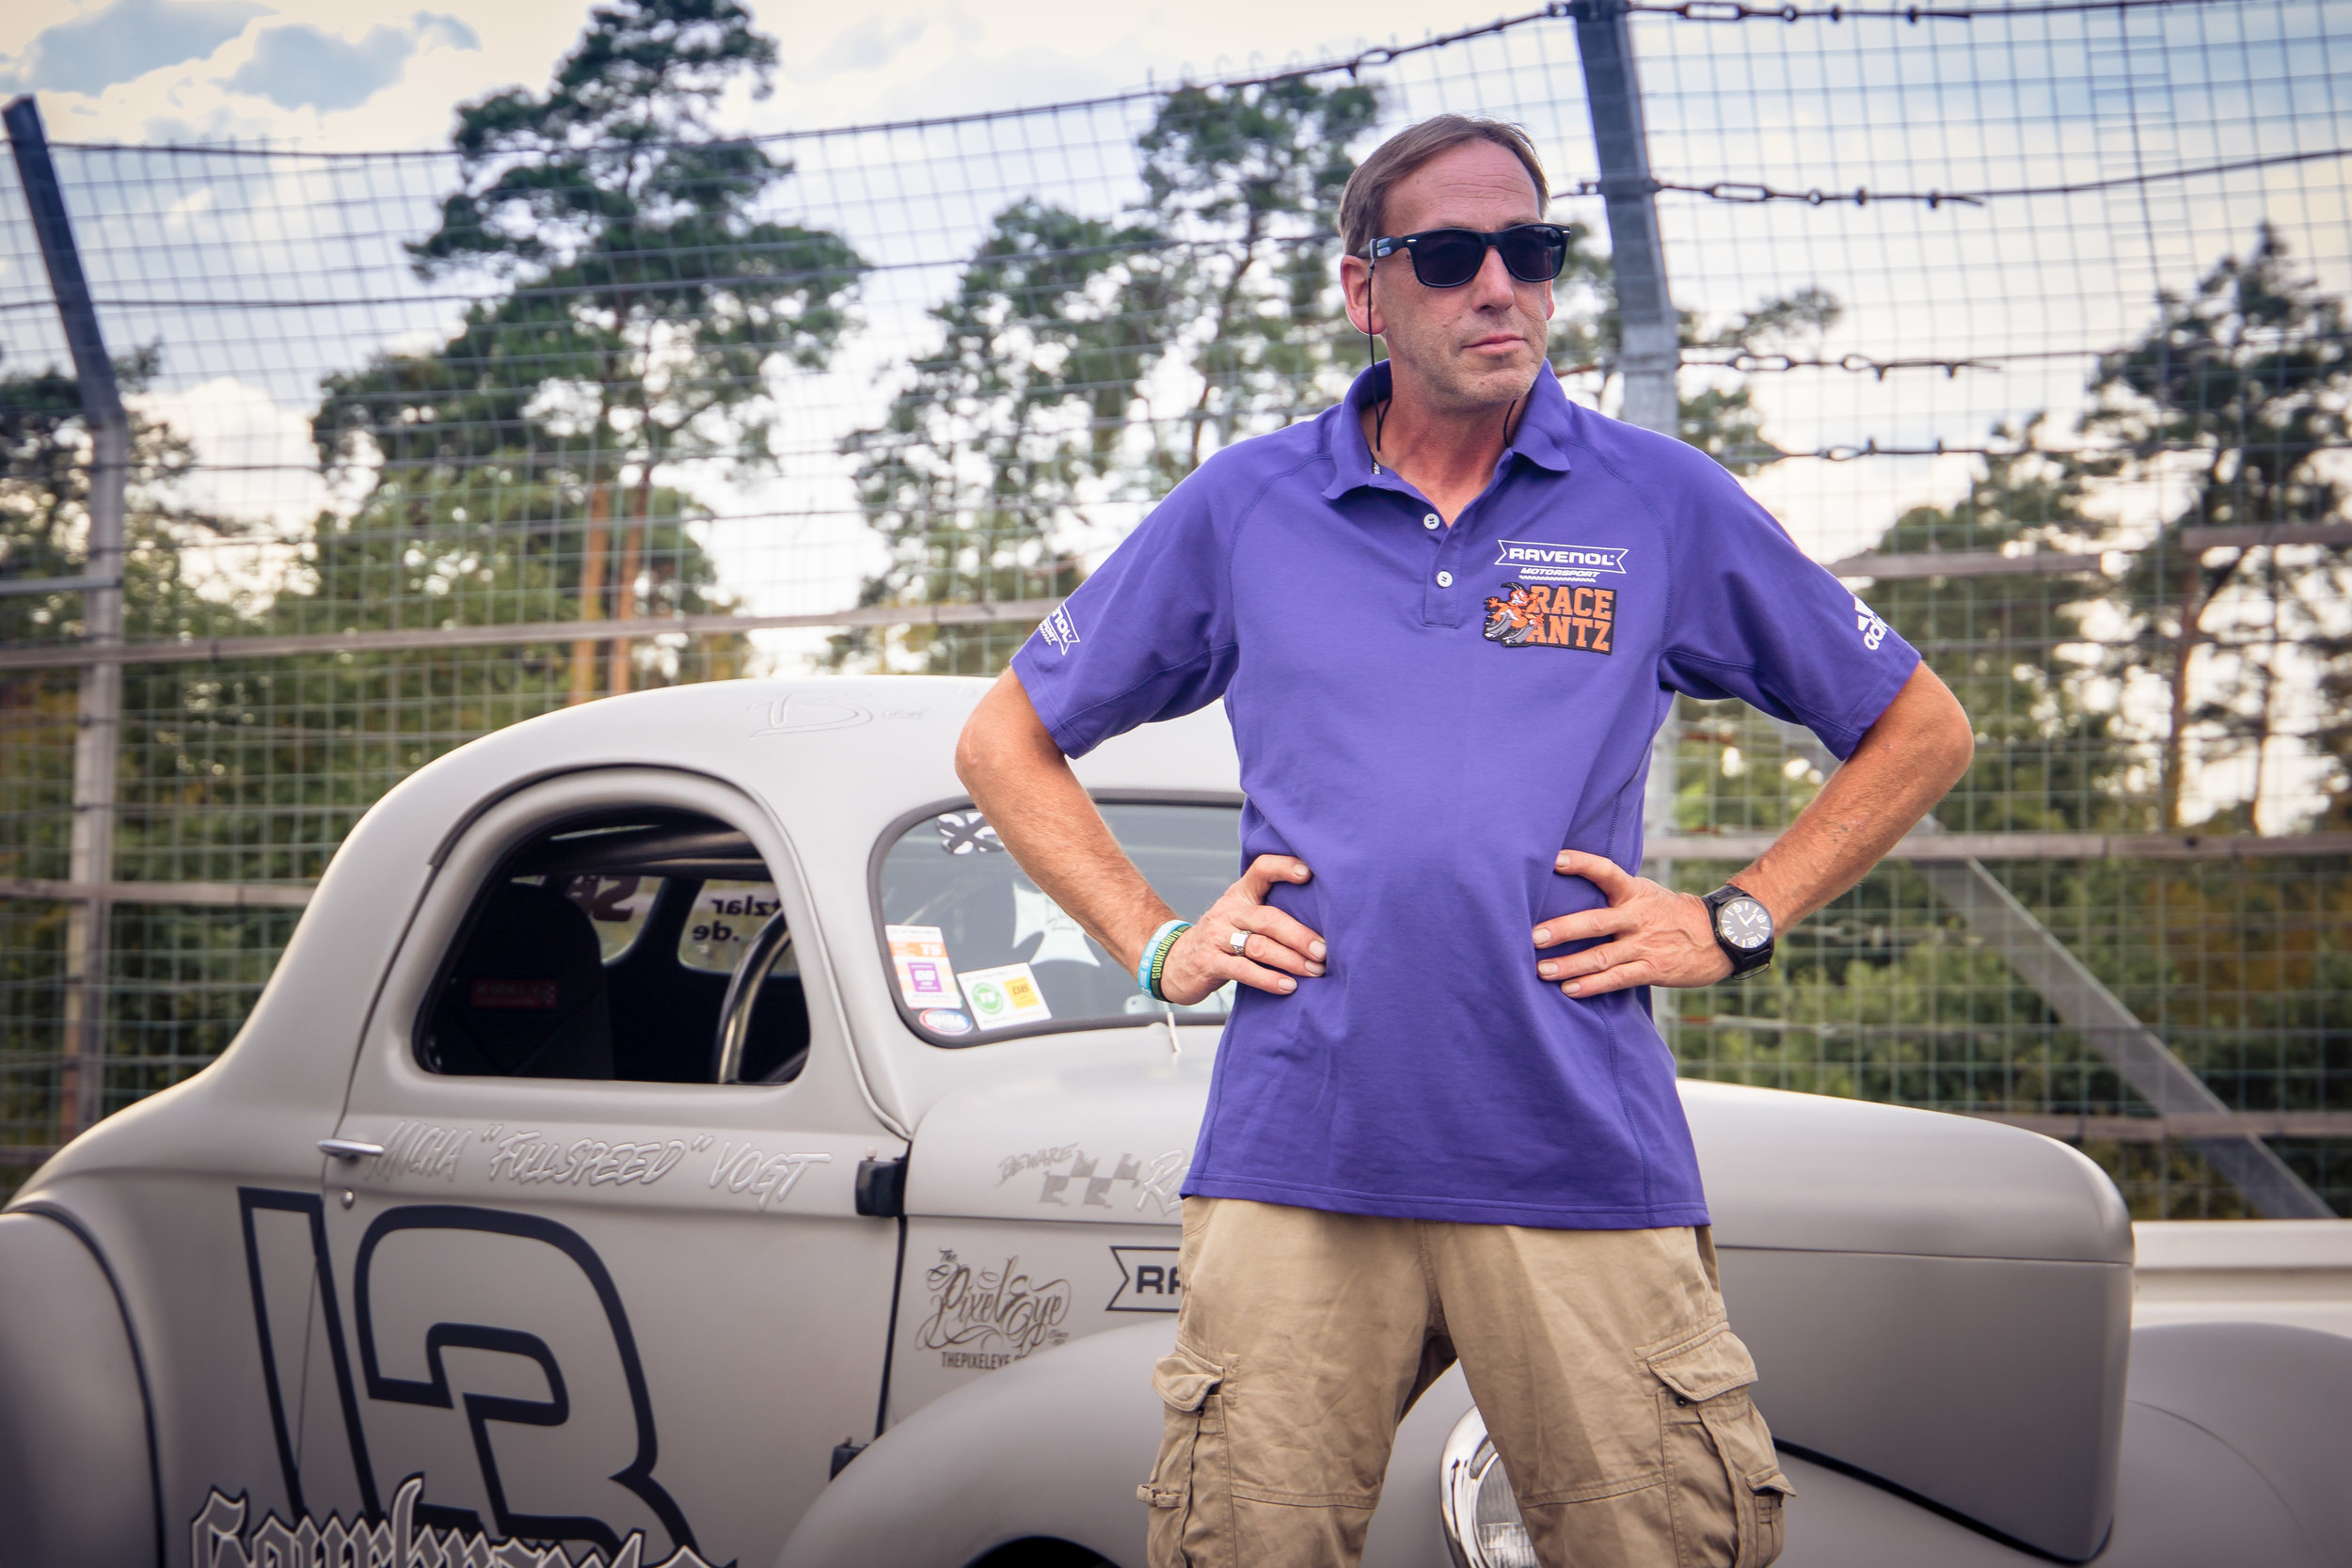 Race Antz NitrolympX 2018-9118.jpg